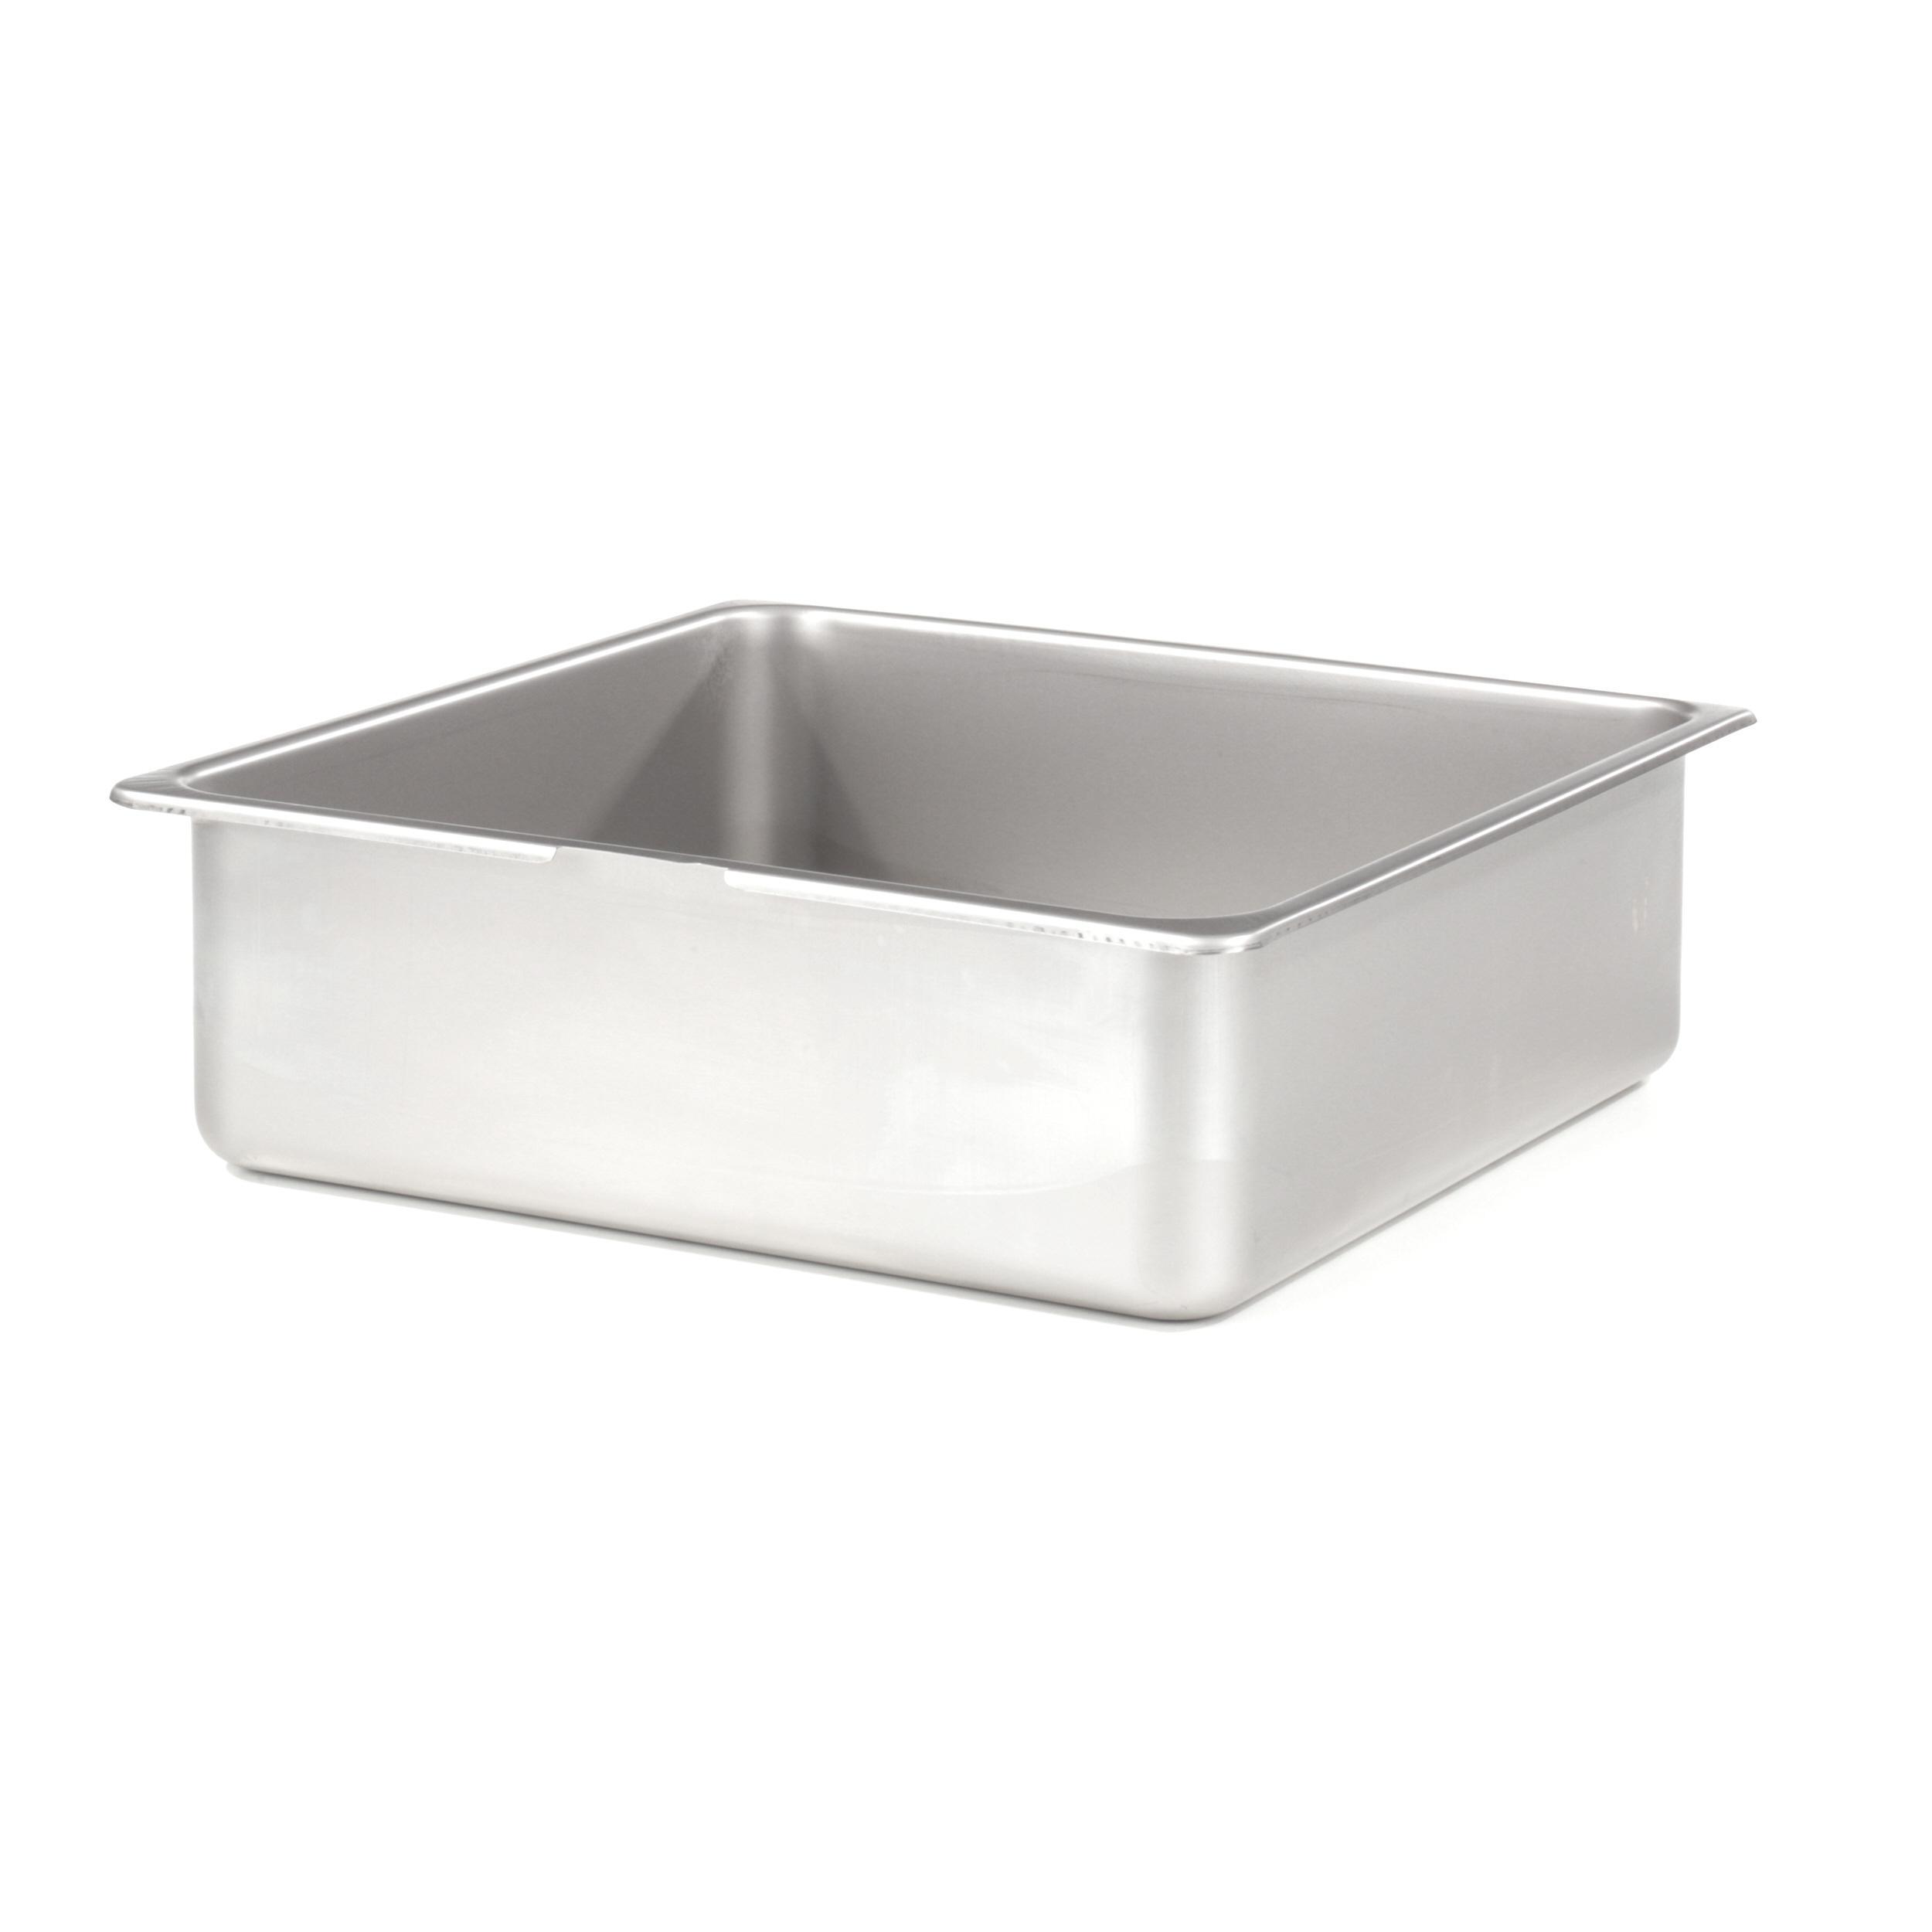 TOASTMASTER PAN 17-5/8X17-5/8X5-1/2